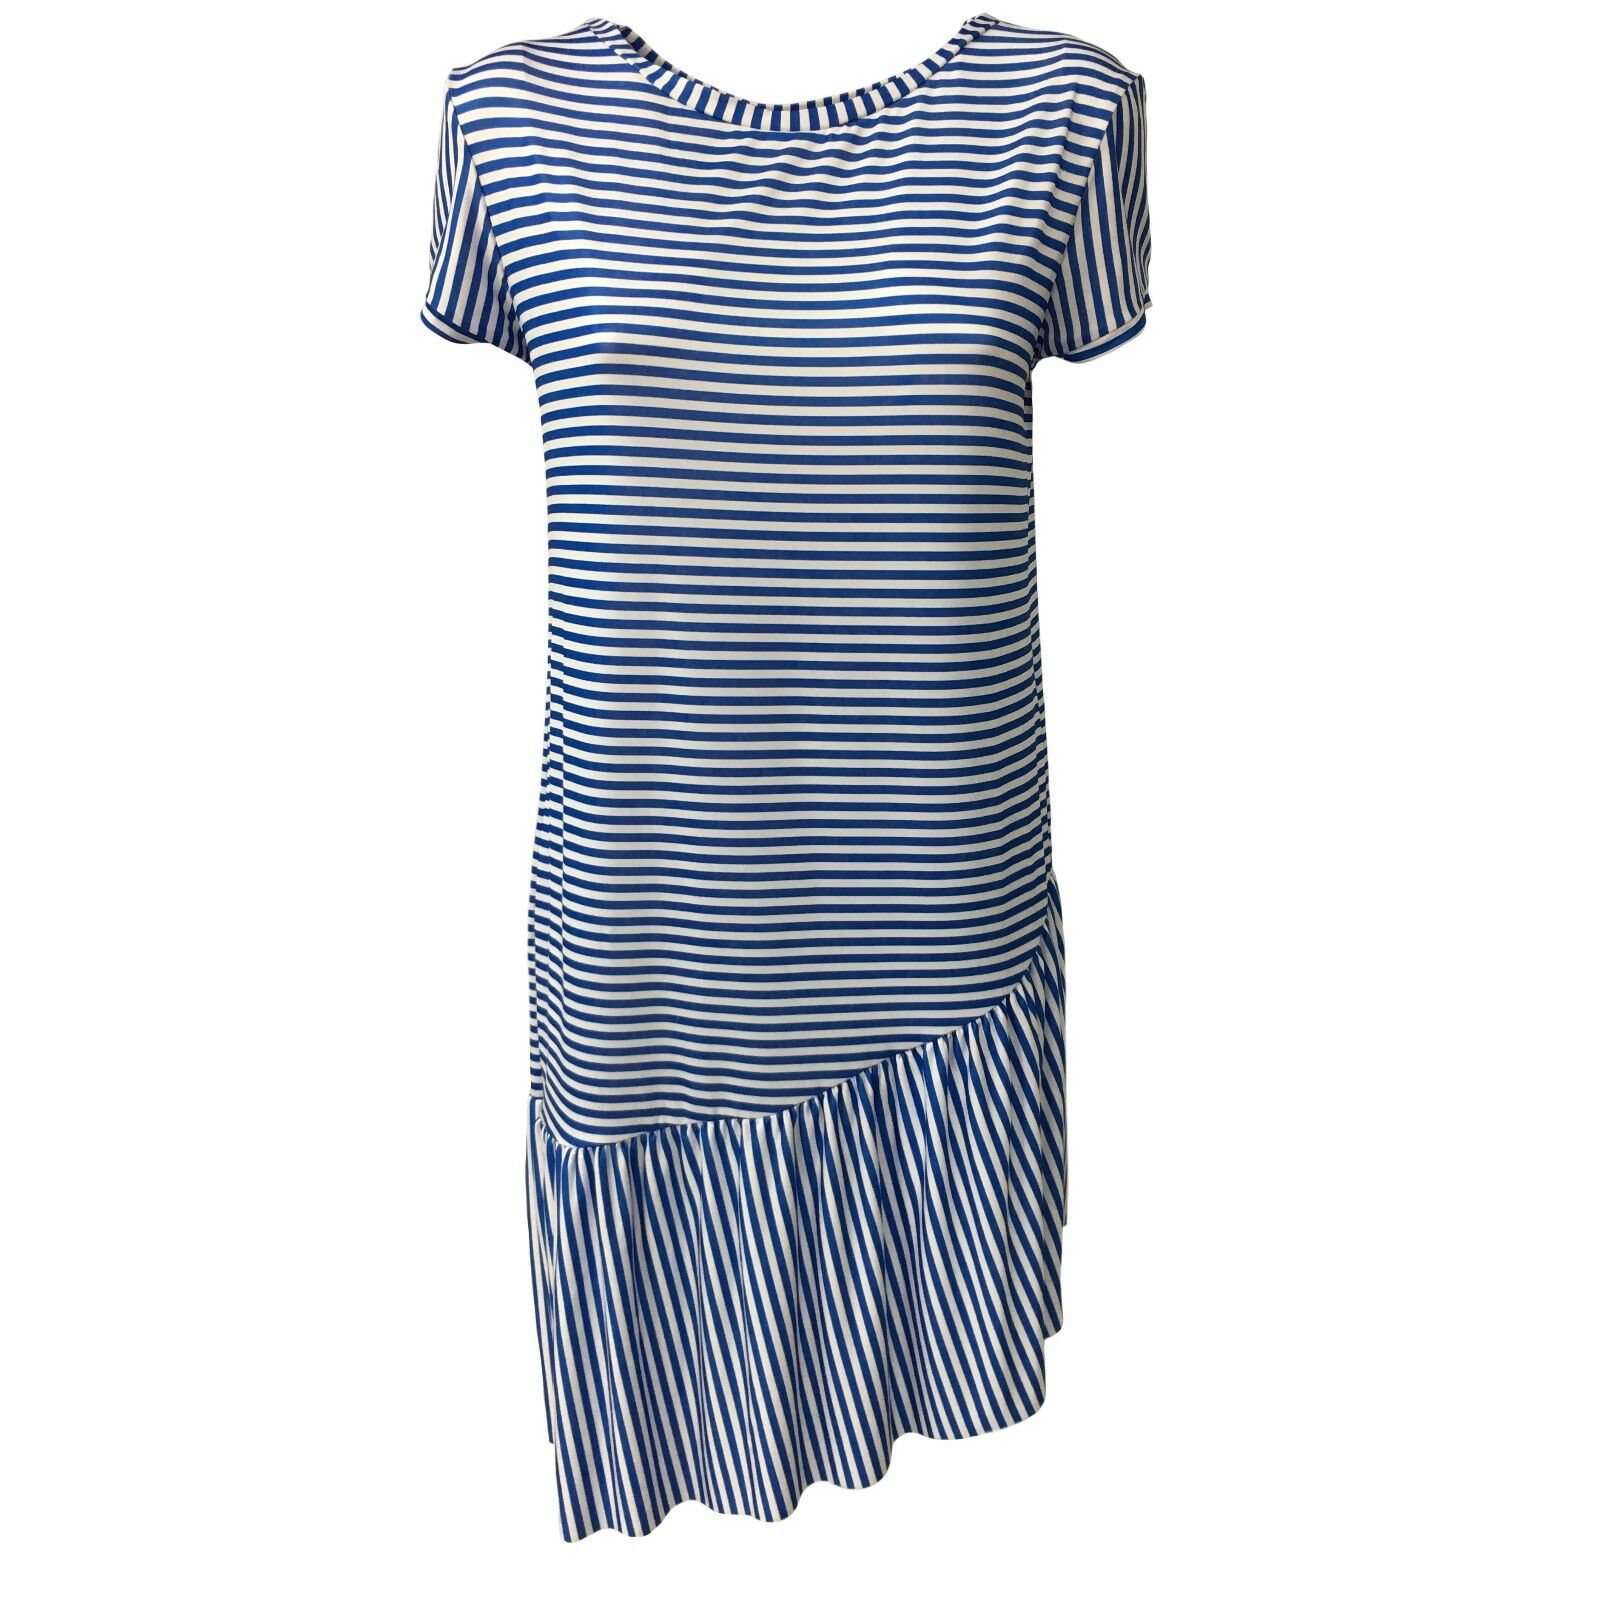 BYE BYE MARY by JUSTMINE abito donna righe righe righe azzurro bianco mod LEMONADE YARA561 a9559a